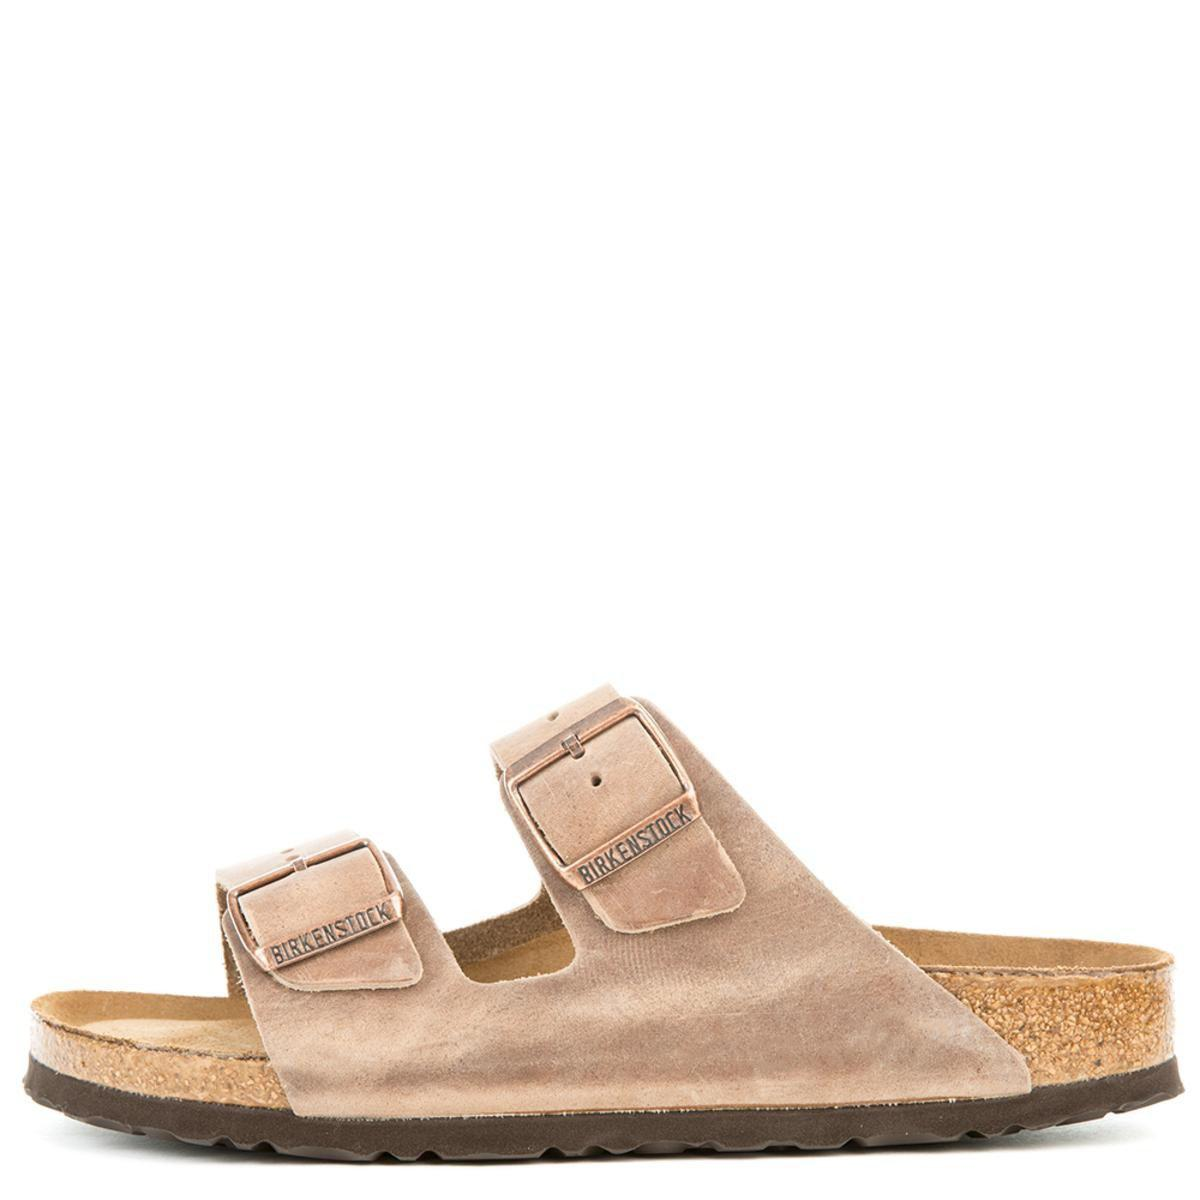 4b8e03b748 Birkenstock - Narrow Arizona Waxy Leather Soft Footbed Tabacco Brown Sandals  - Lyst. View fullscreen